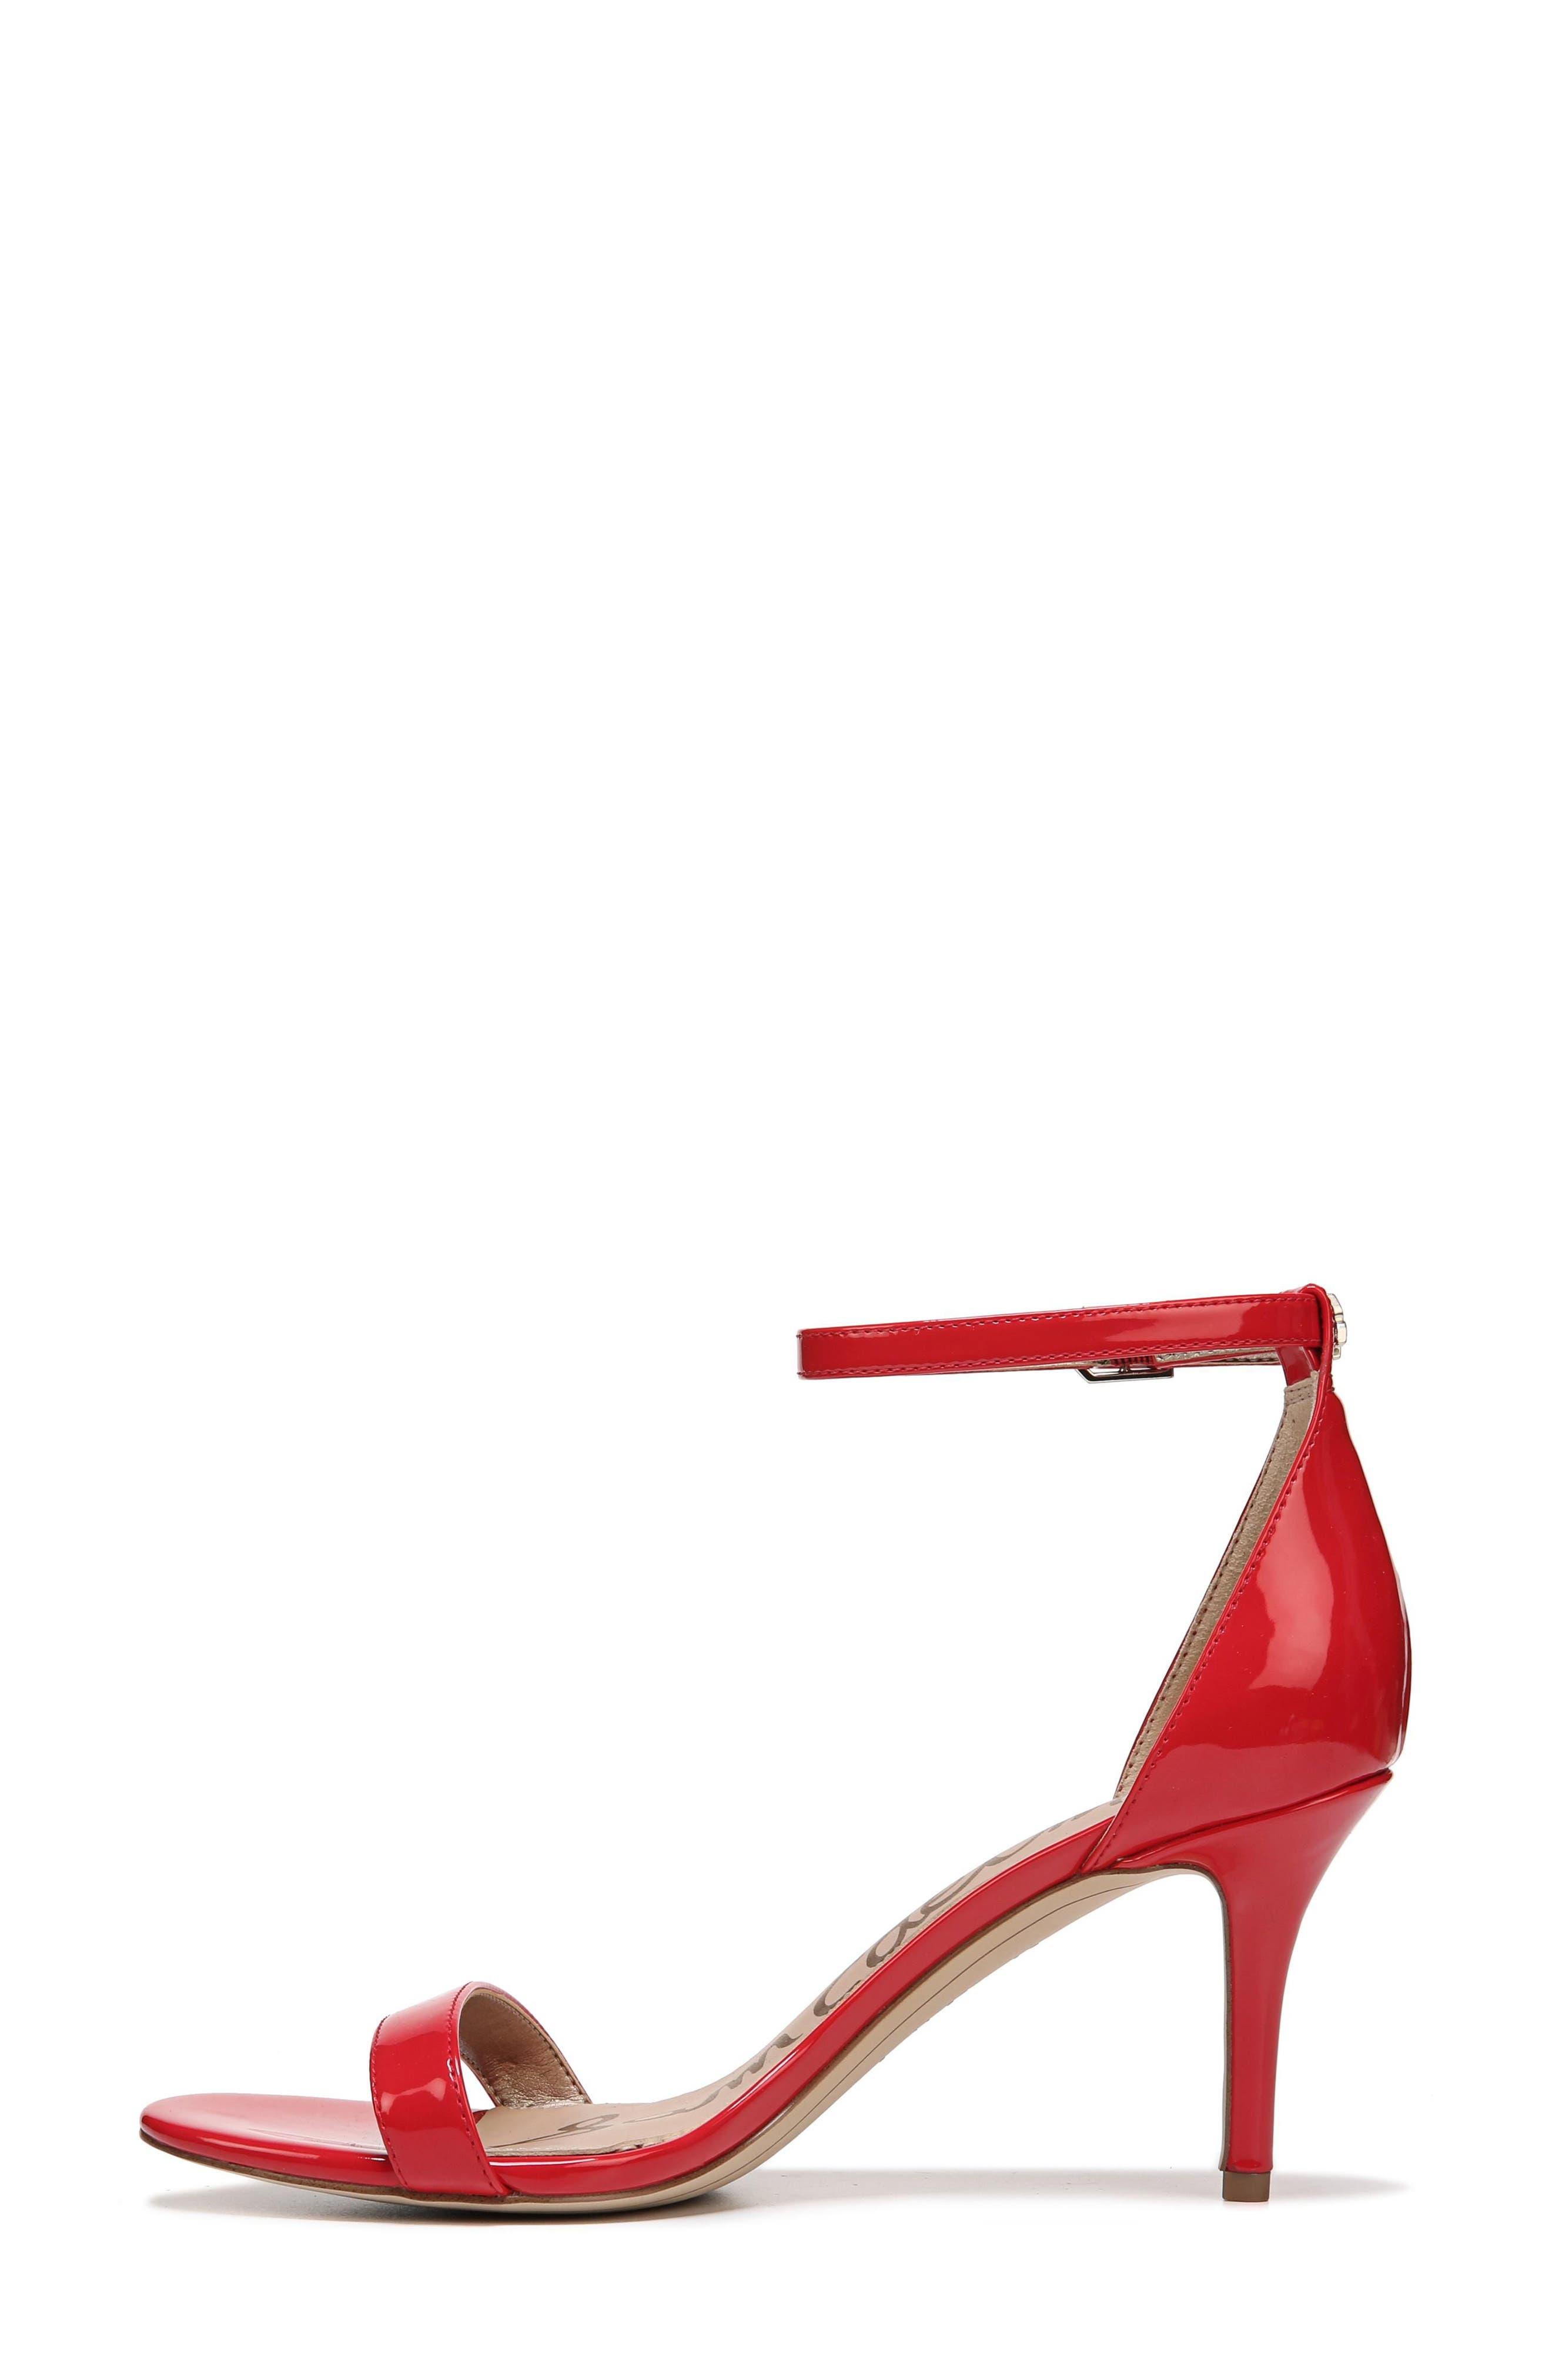 ,                             'Patti' Ankle Strap Sandal,                             Alternate thumbnail 116, color,                             606